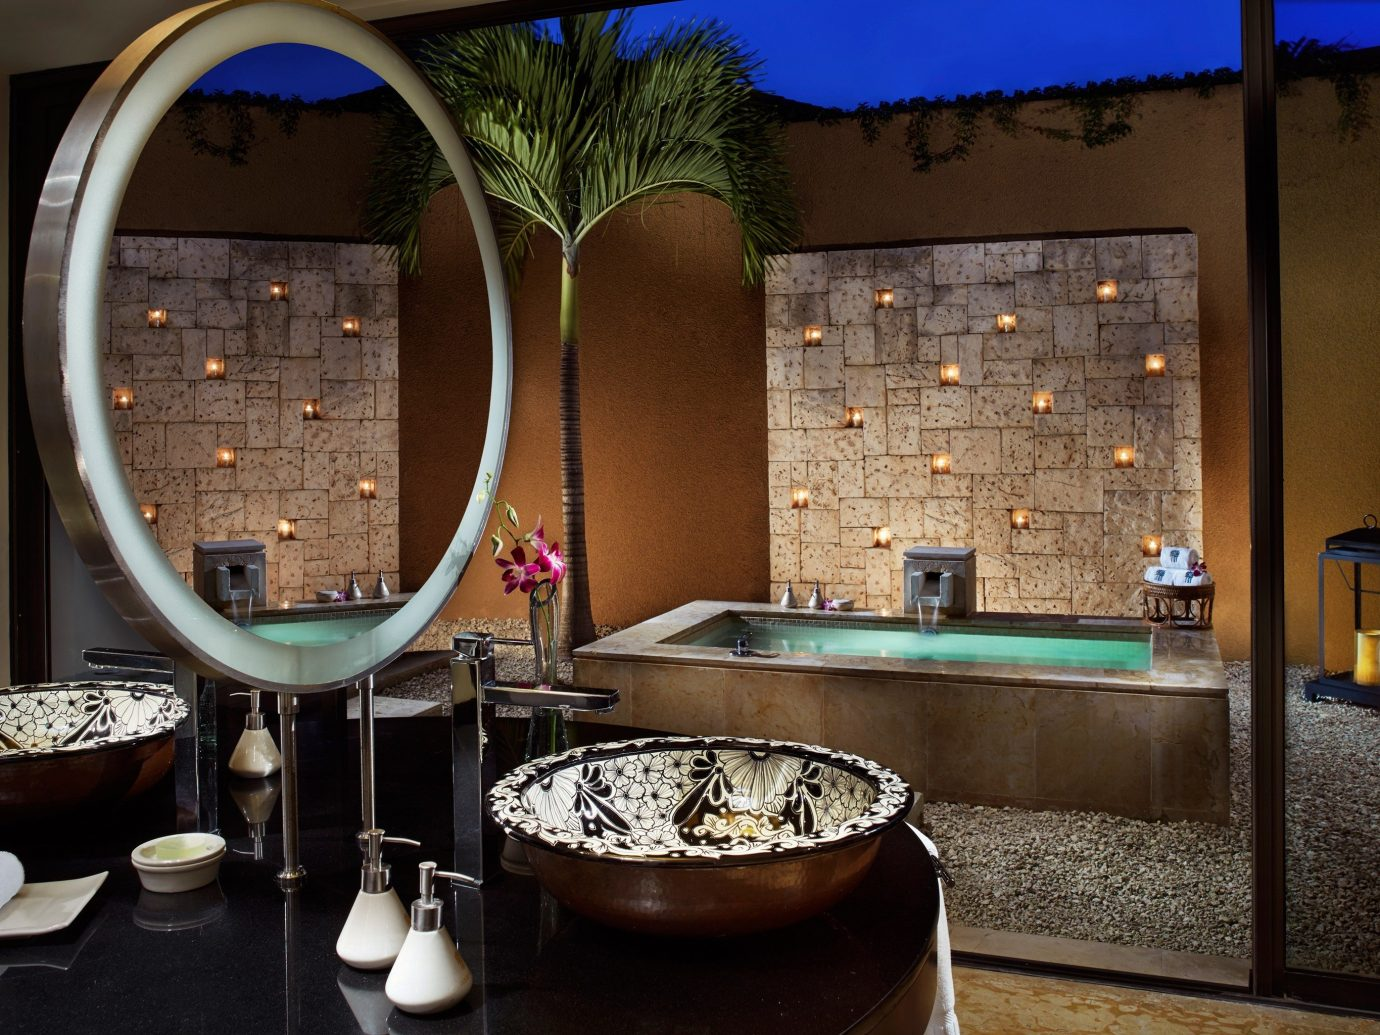 Hotels Offbeat wall room indoor property estate bathroom home interior design Suite restaurant swimming pool Bar Villa living room